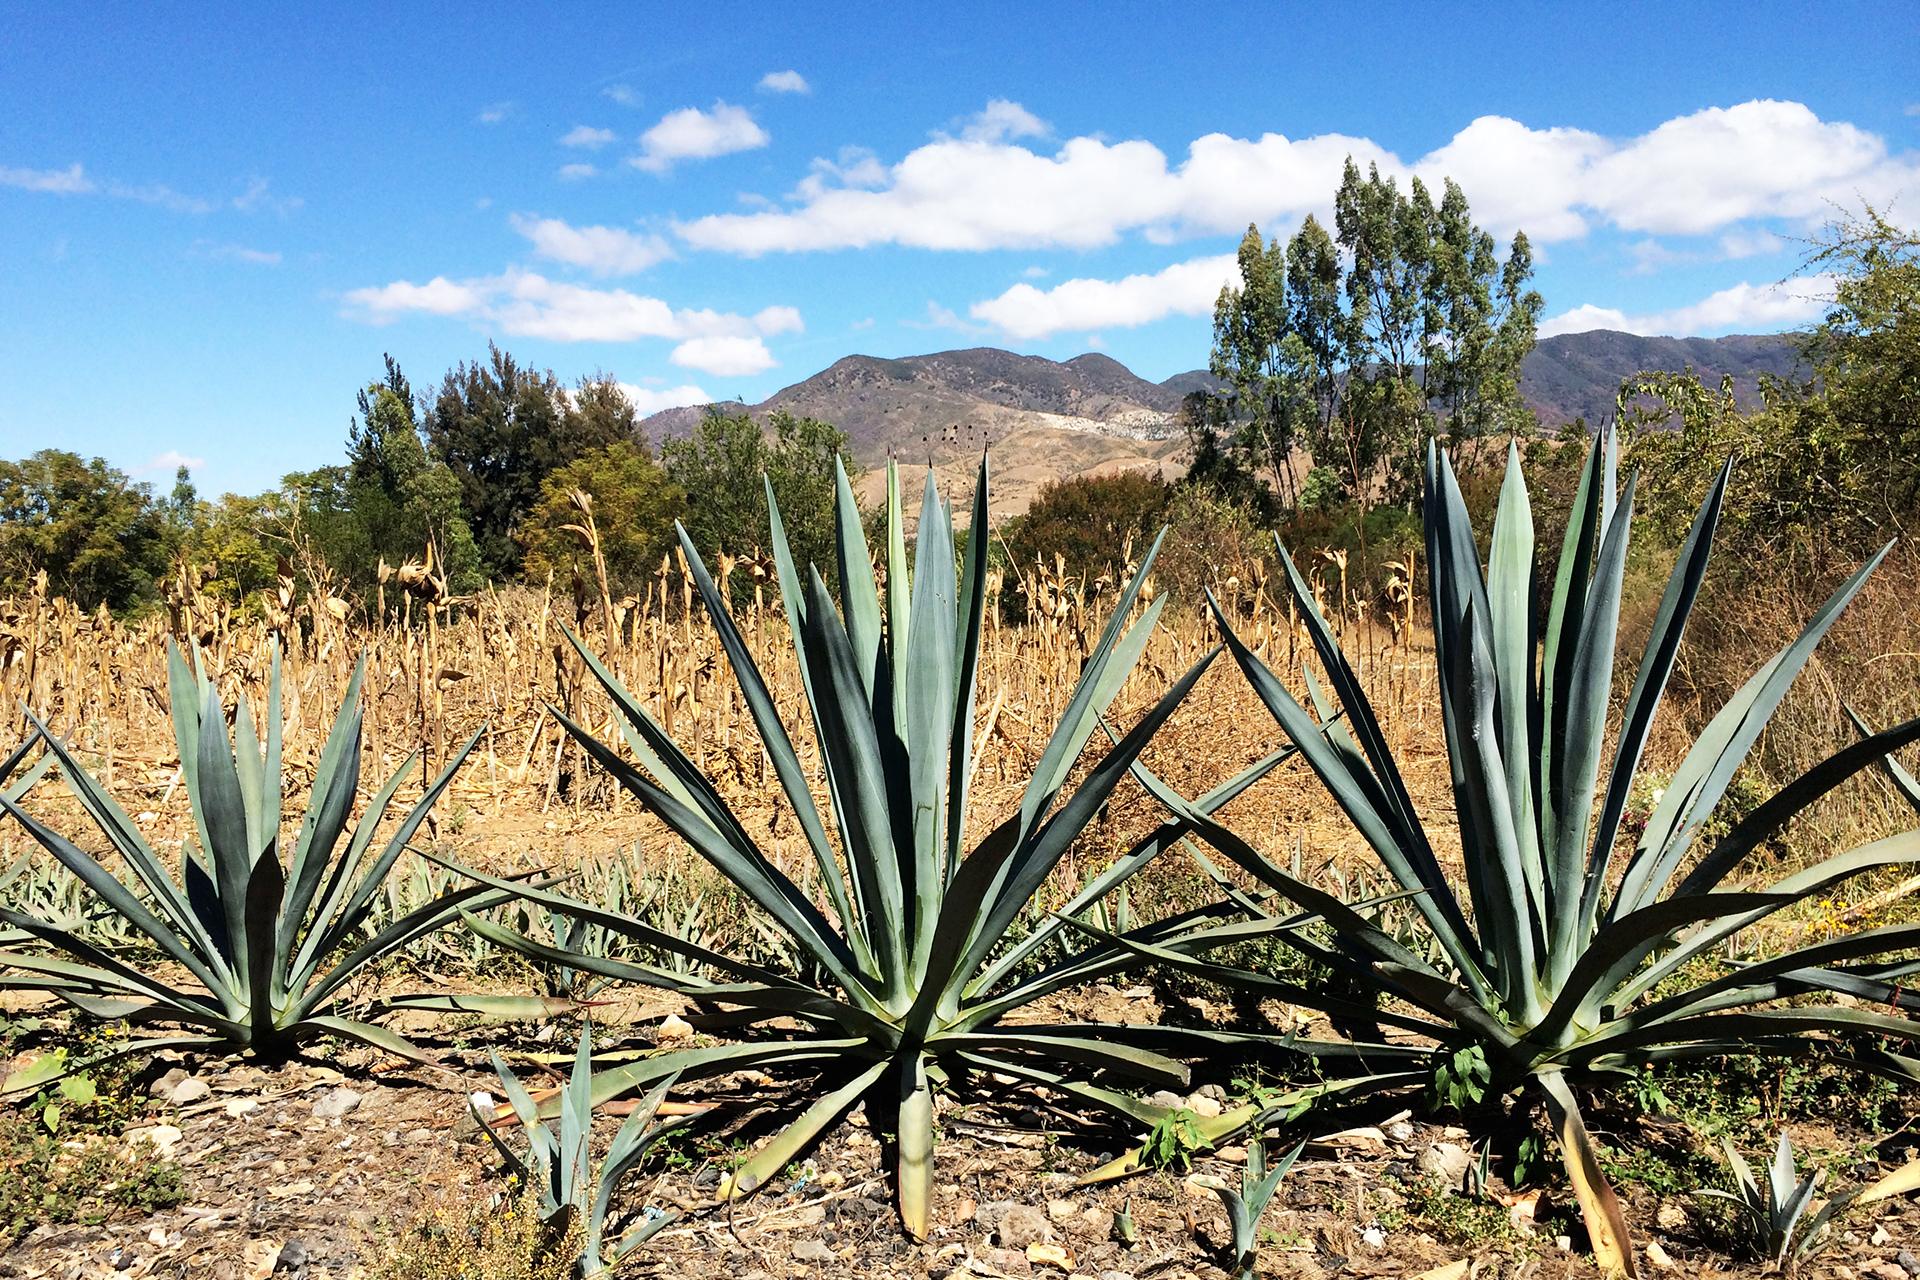 oaxaca-mexico-mezcal-tour_agave_plant